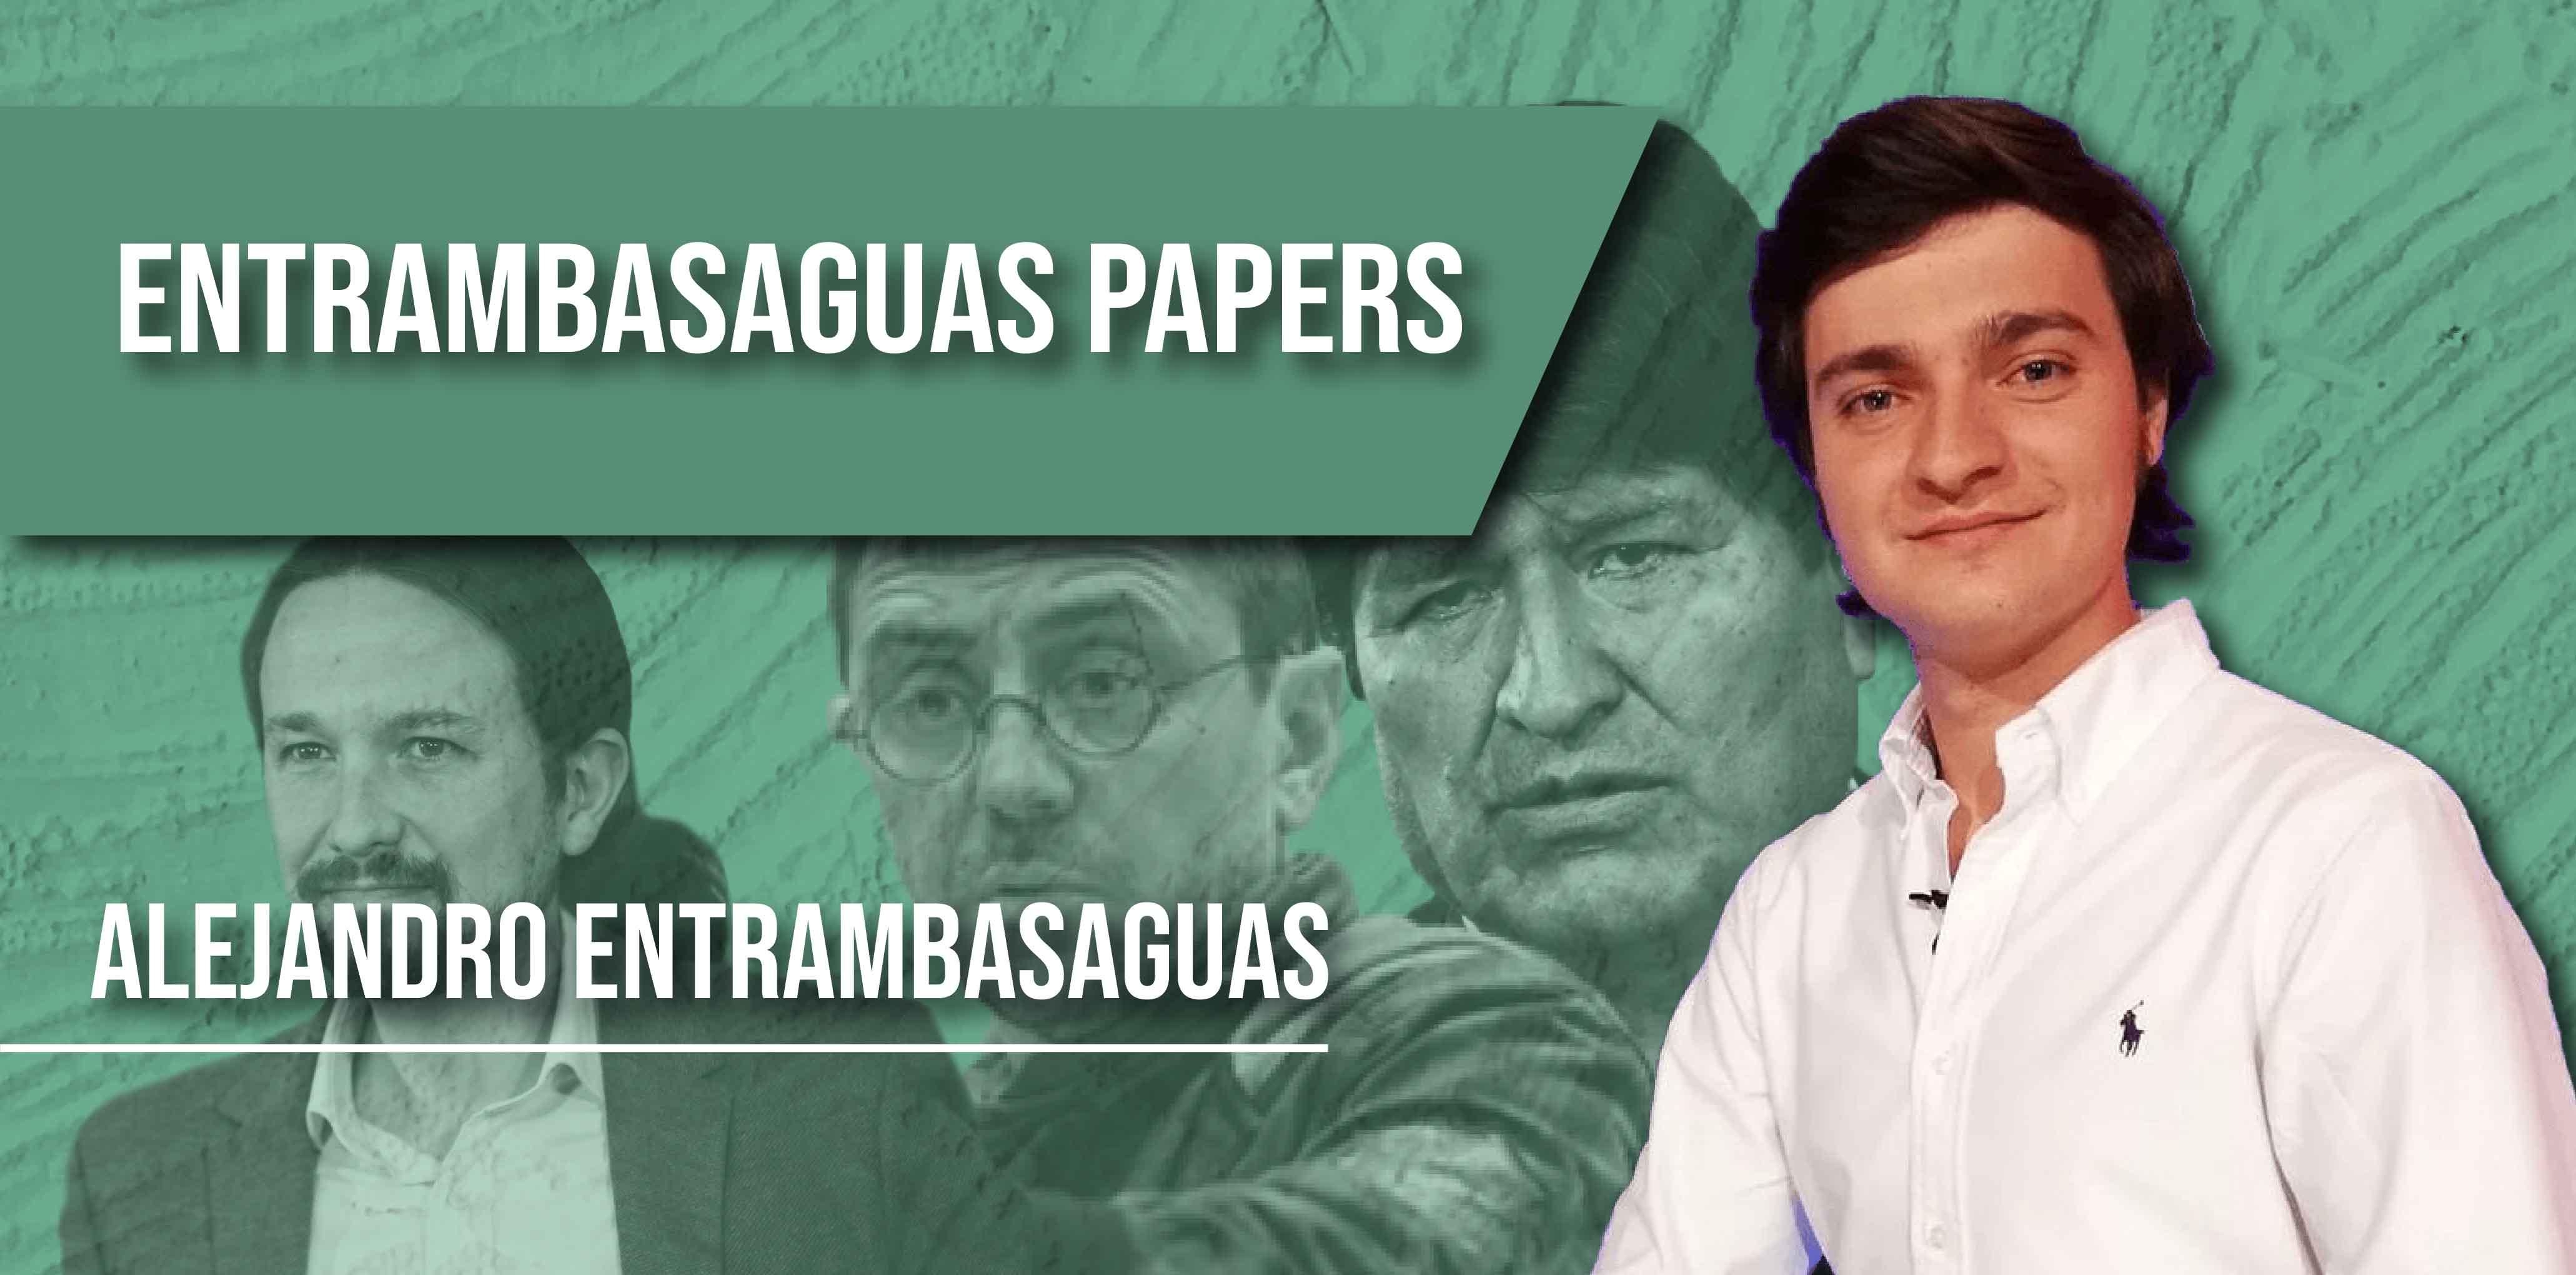 Entrambasaguas Papers